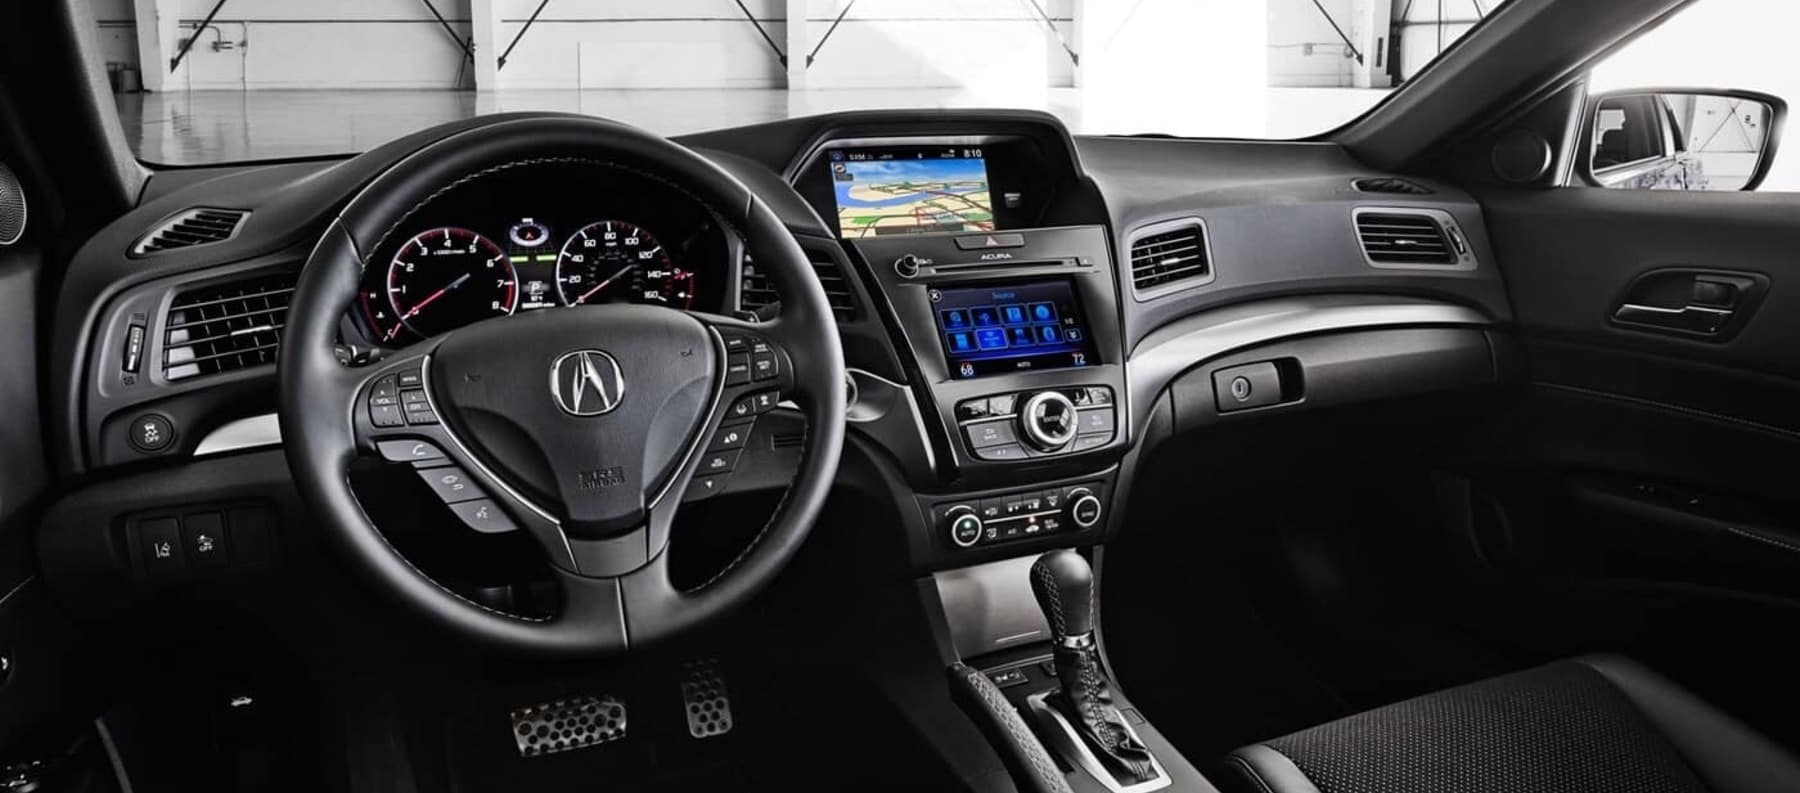 2018 Acura ILX Cockpit